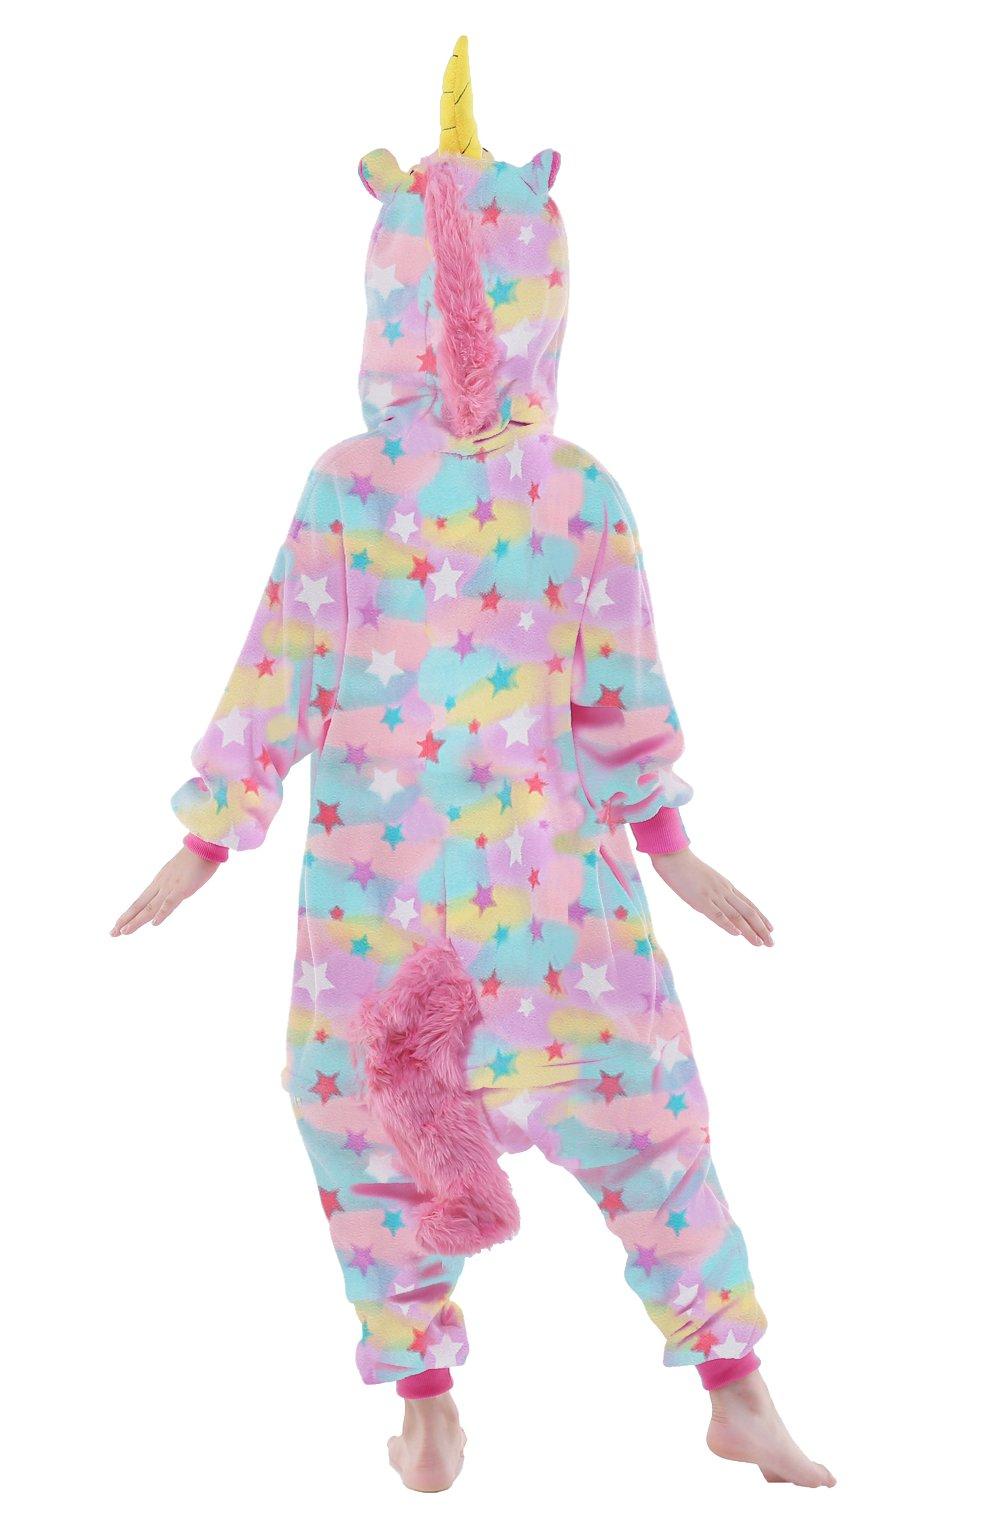 NEWCOSPLAY Cartoon Christmas Costumes Unisex Kids Unicorn Pajamas Gifts (115, color unicorn) by NEWCOSPLAY (Image #3)